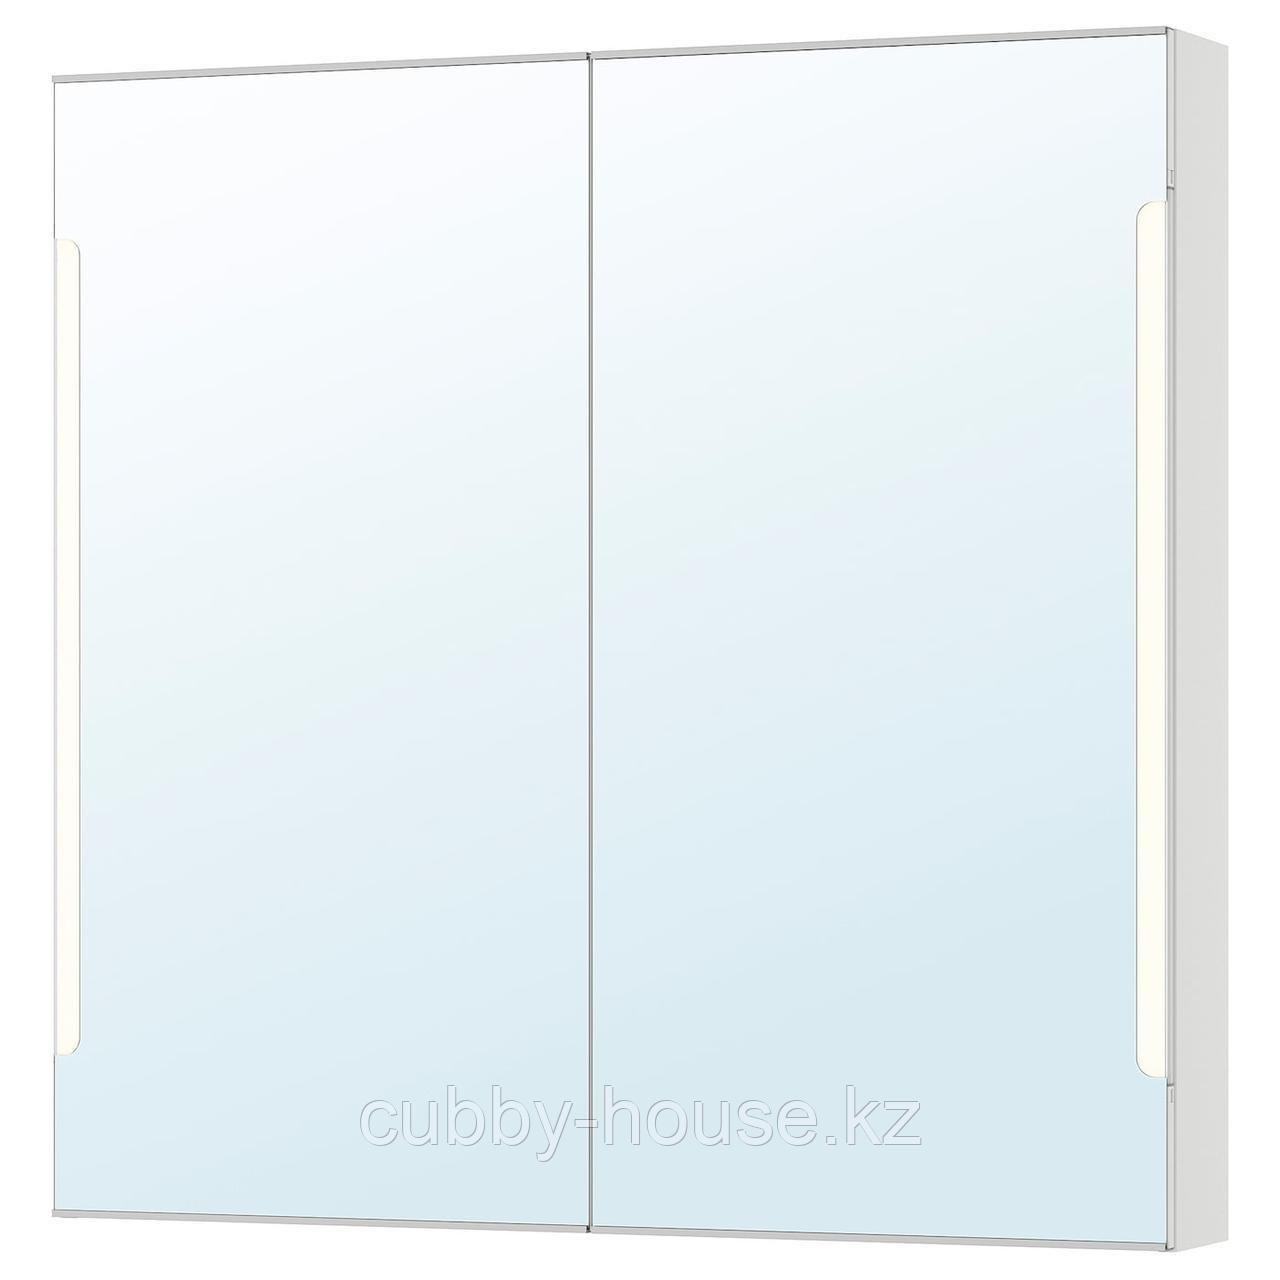 СТОРЙОРМ Зеркальн шкафчик/2дверцы/подсветка, белый, 100x14x96 см